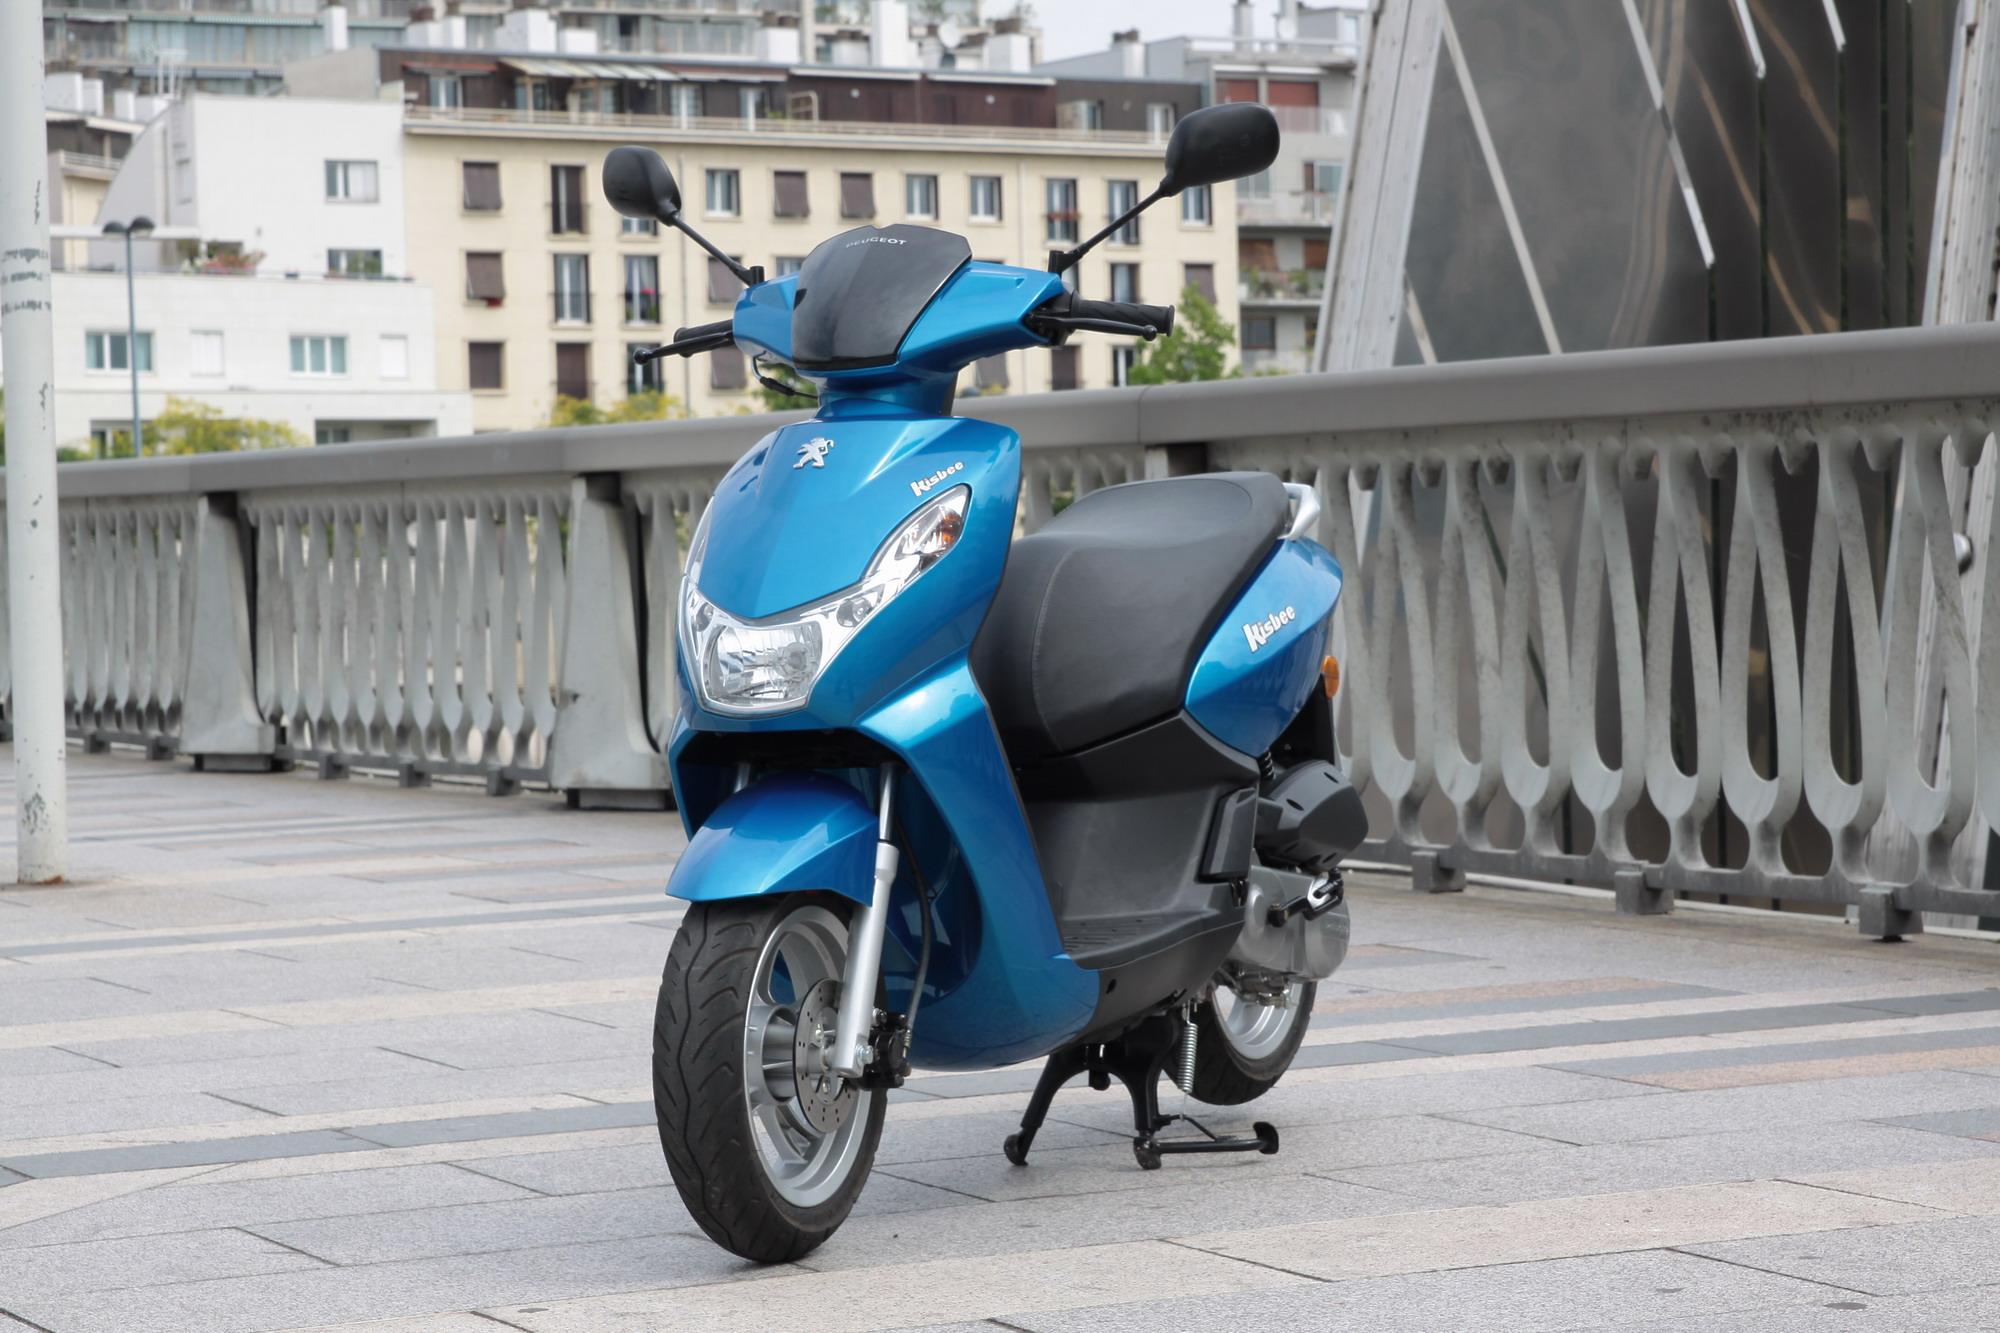 peugeot kisbee le scooter urbain universel actualit s scooter par scooter mag. Black Bedroom Furniture Sets. Home Design Ideas